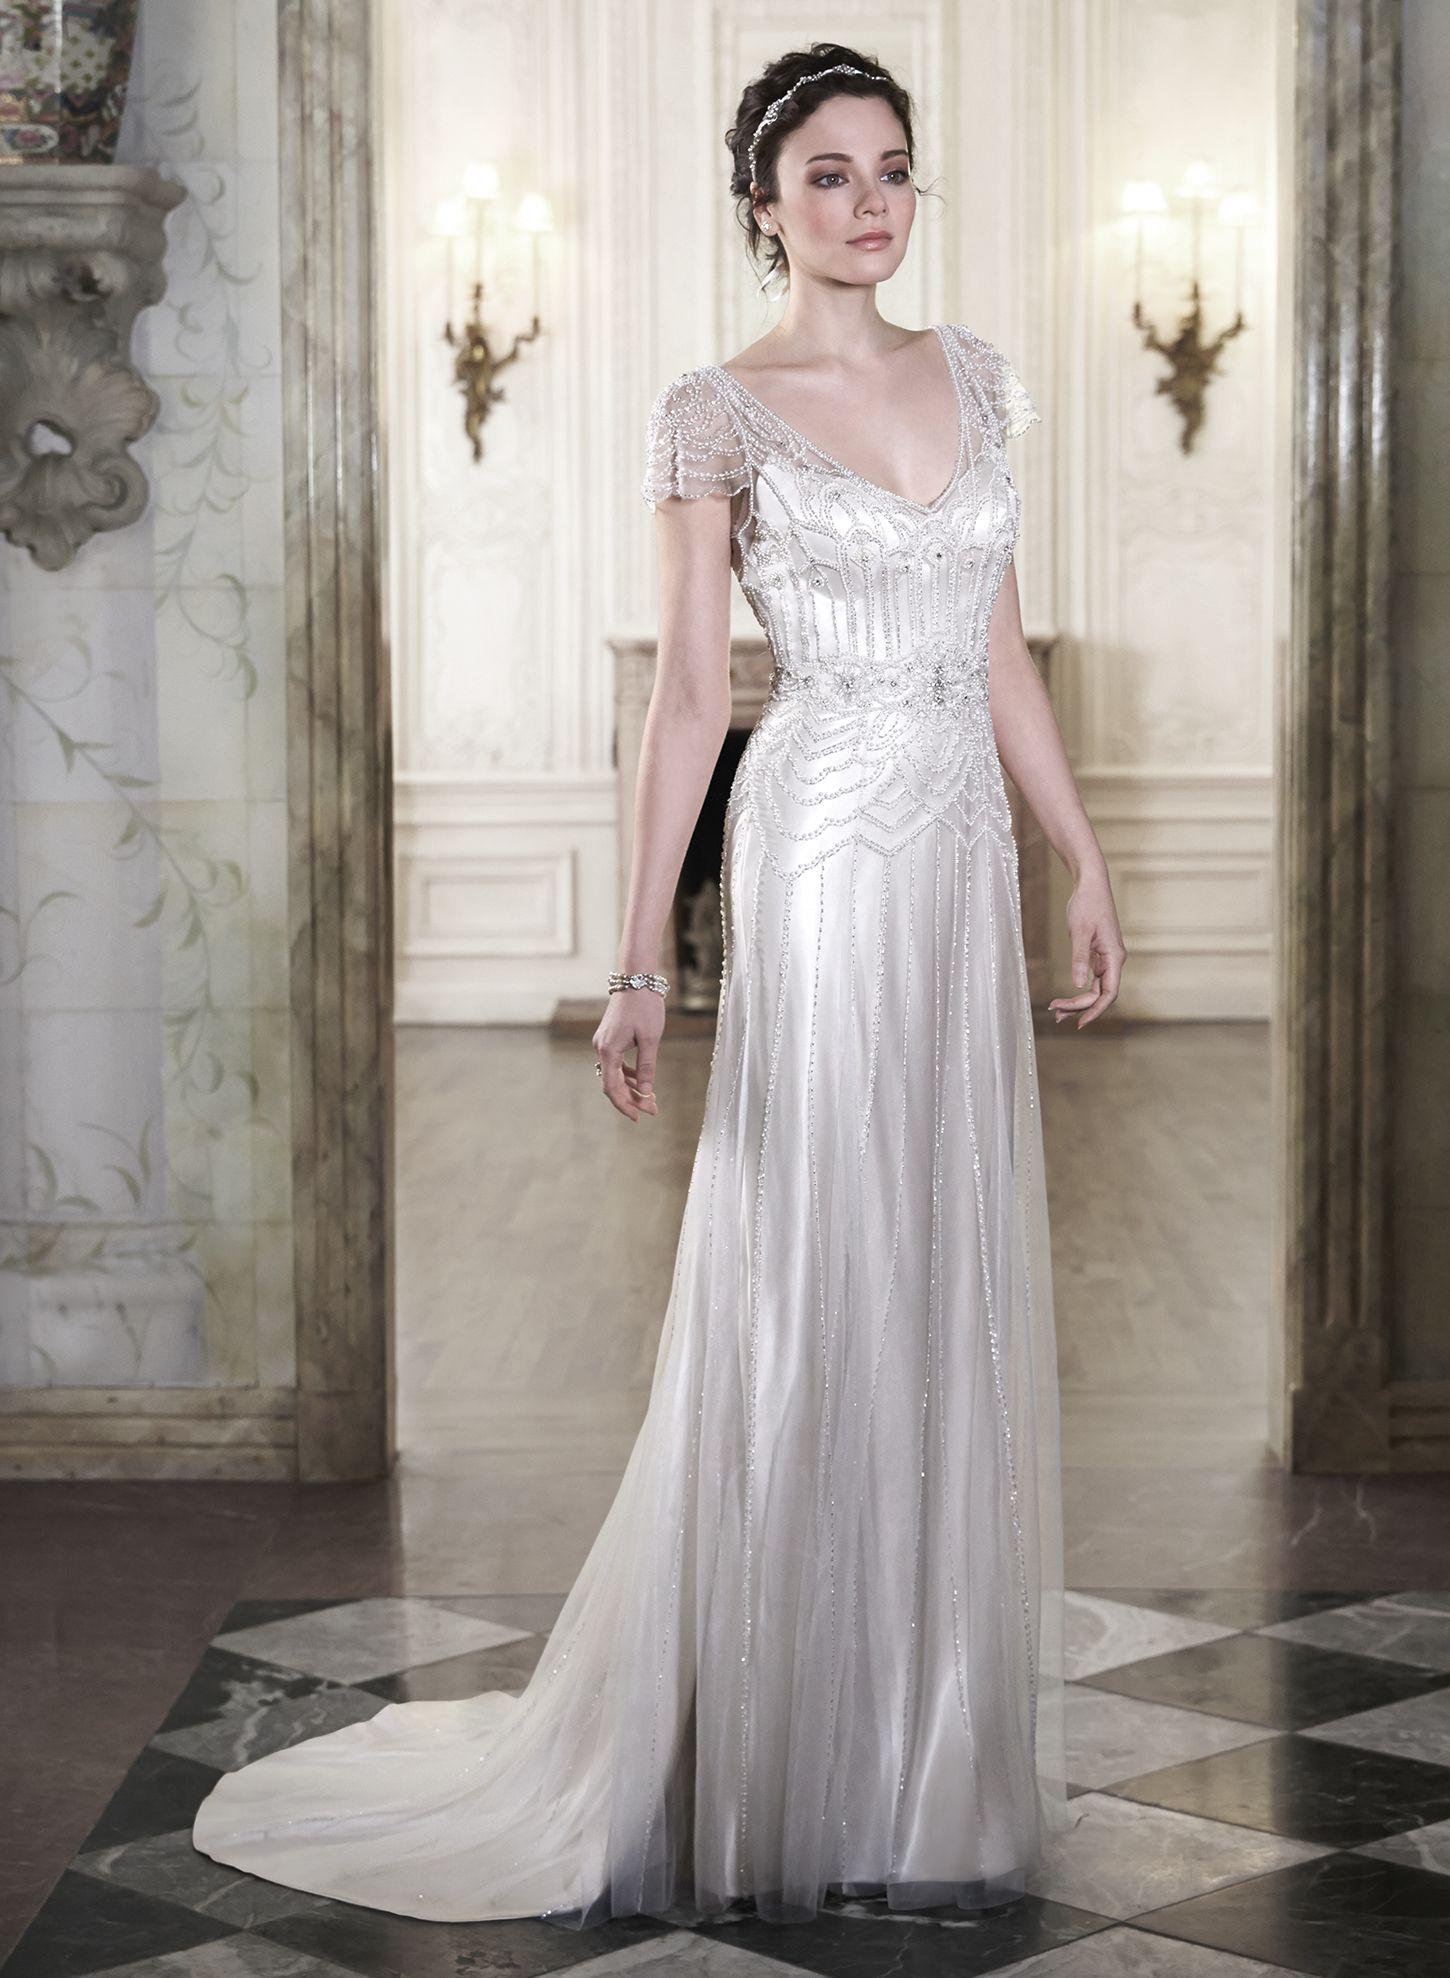 Maggie Sottero Ettia At The Bridal Collection In Denver Co 720 493 9454